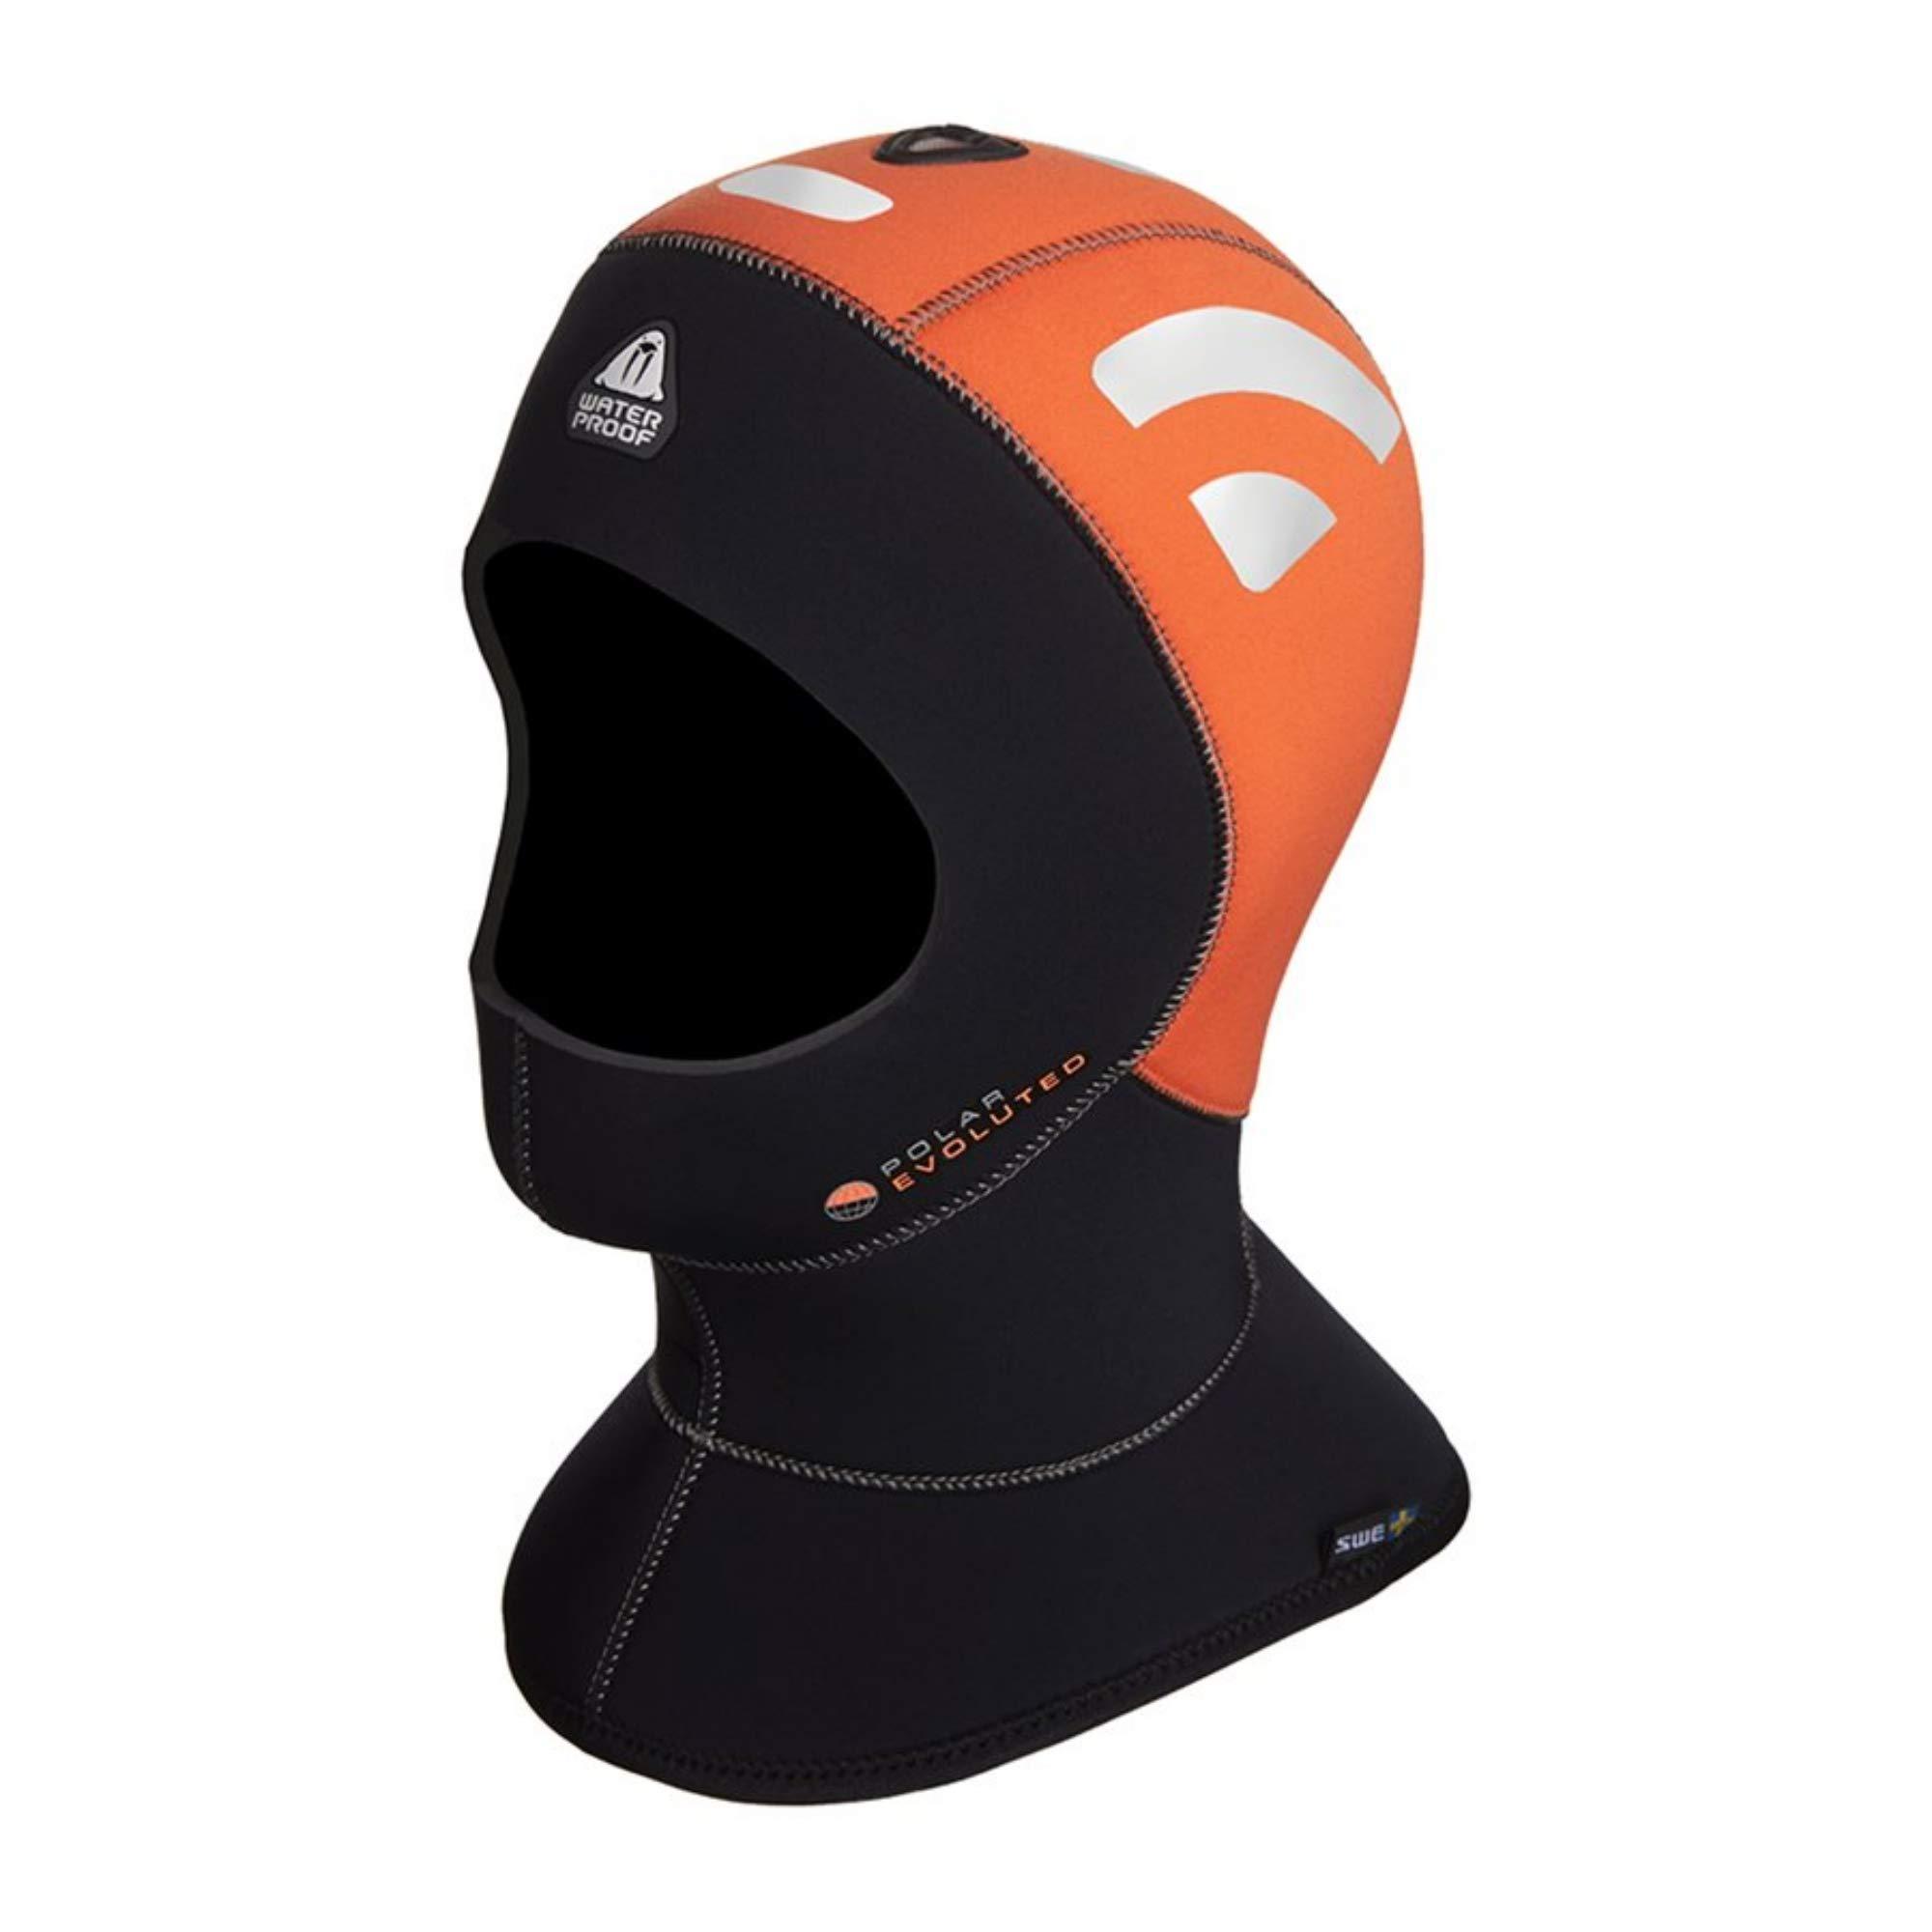 Waterproof H1 5/10mm High Visibility Polar Evo Hood, X-Small by Waterproof